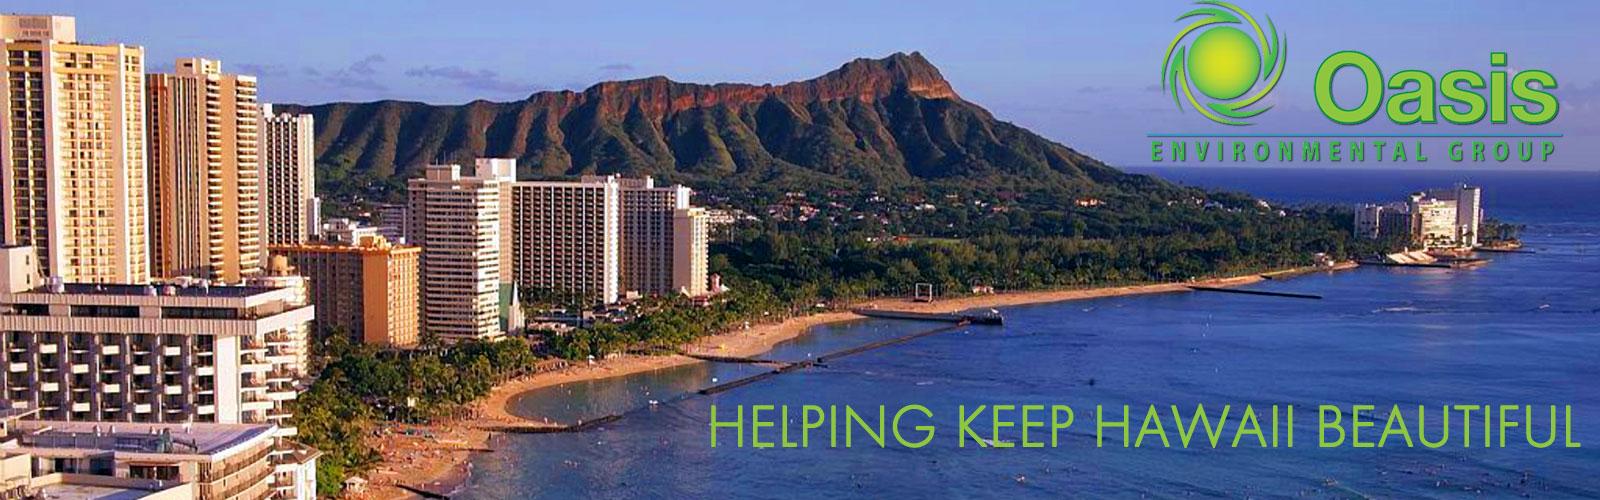 Oahu-hawaii-environmental-recycling-1